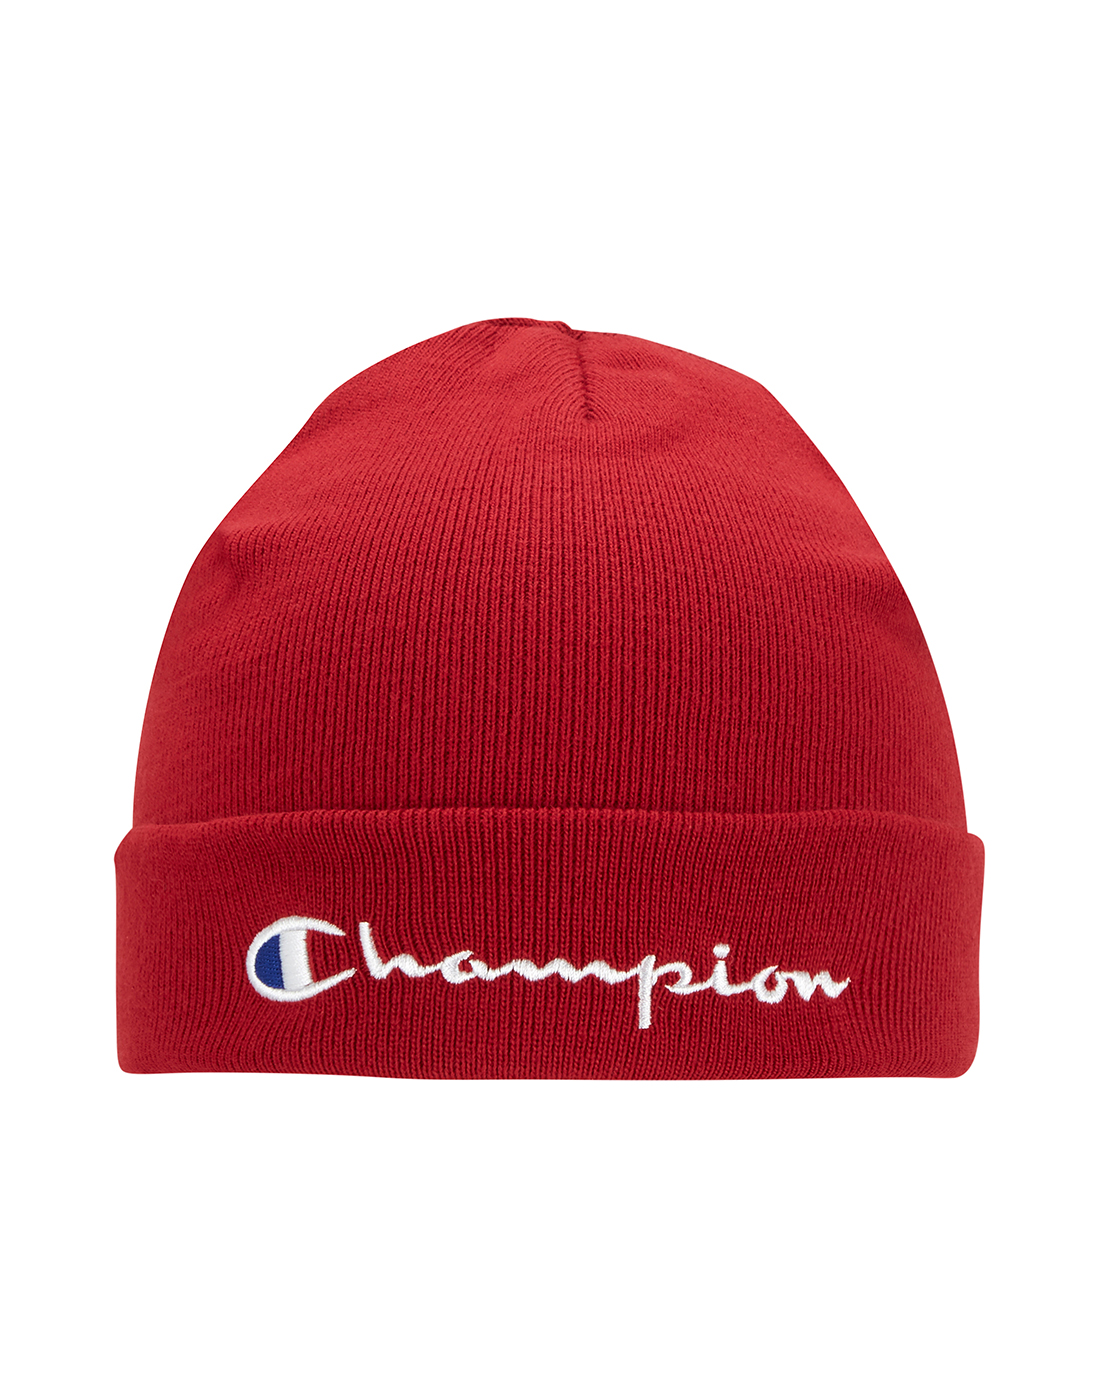 a229168b3 Red Champion Beanie Hat